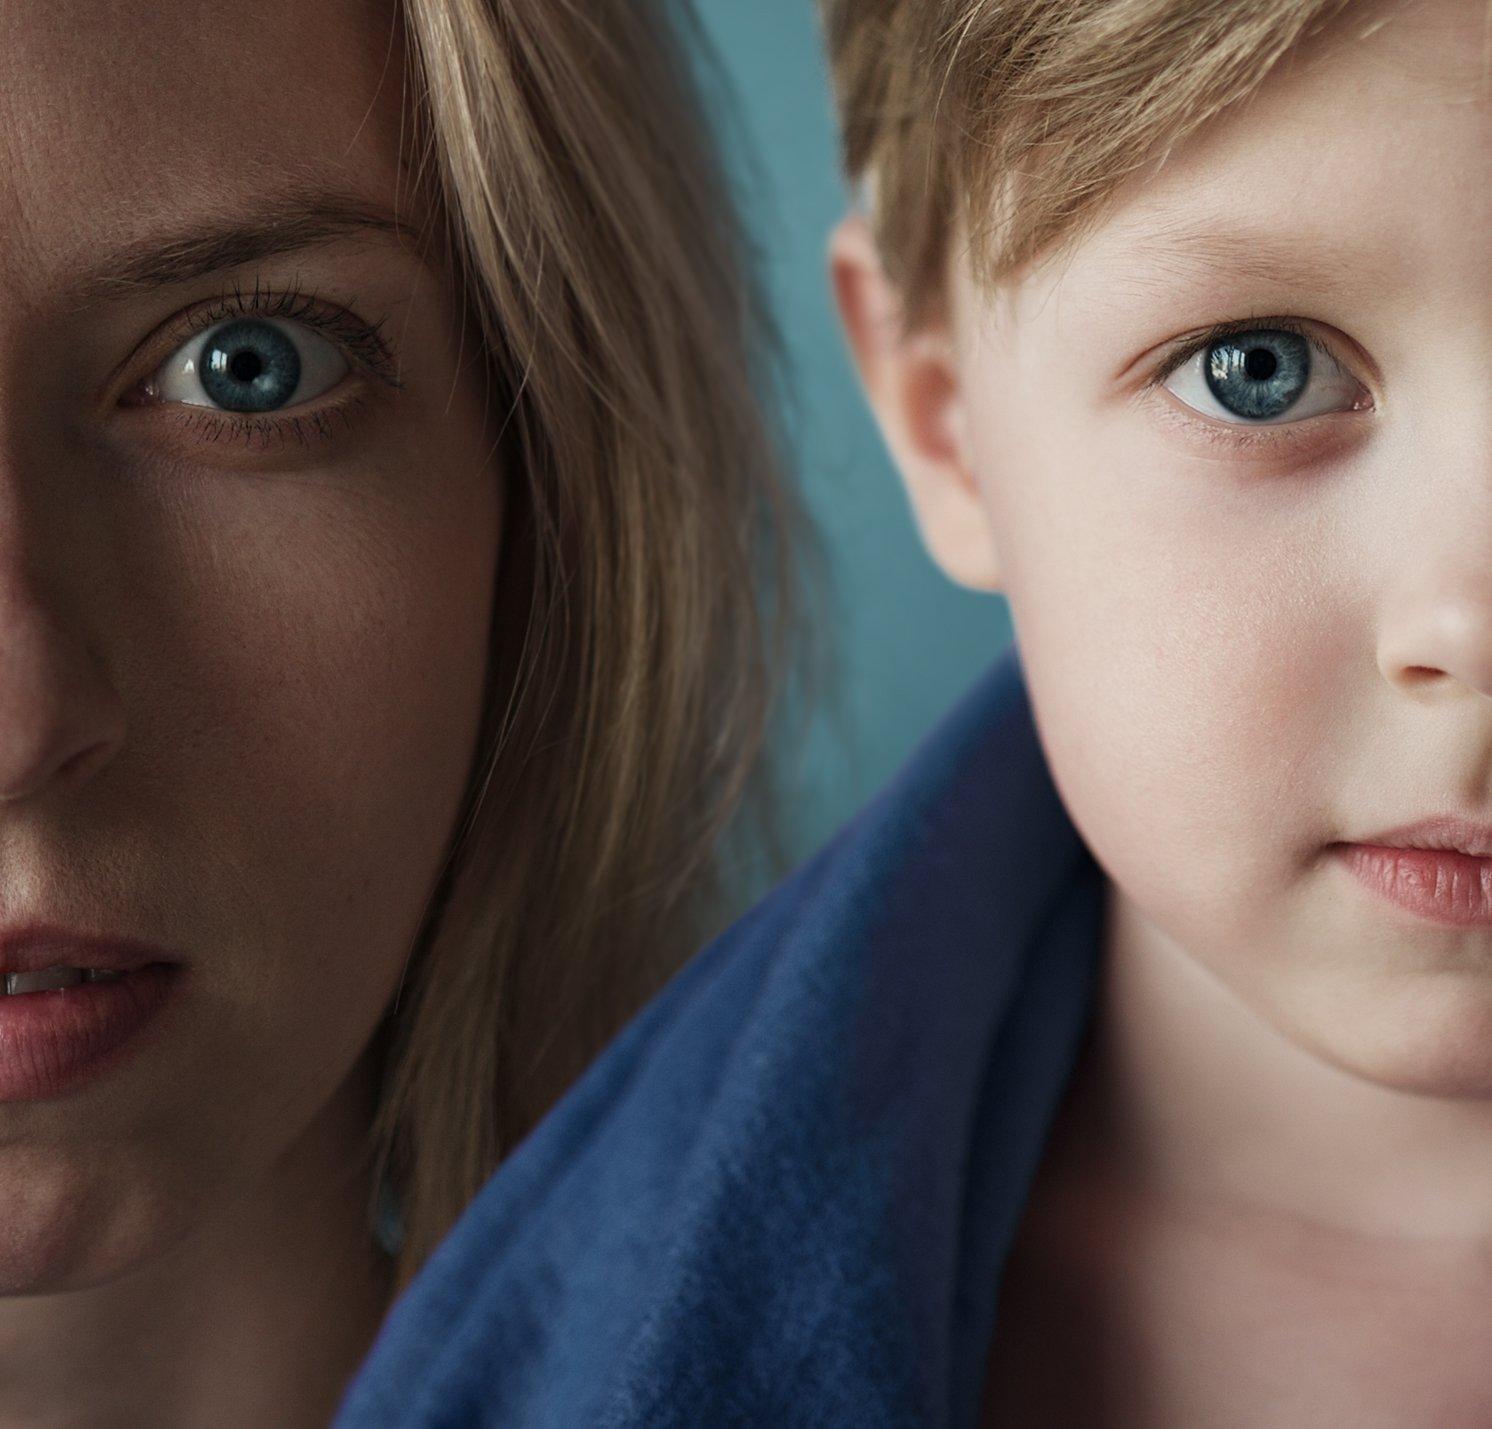 mom, mother, son, nikon, eyes, blue, , Роман Филиппов